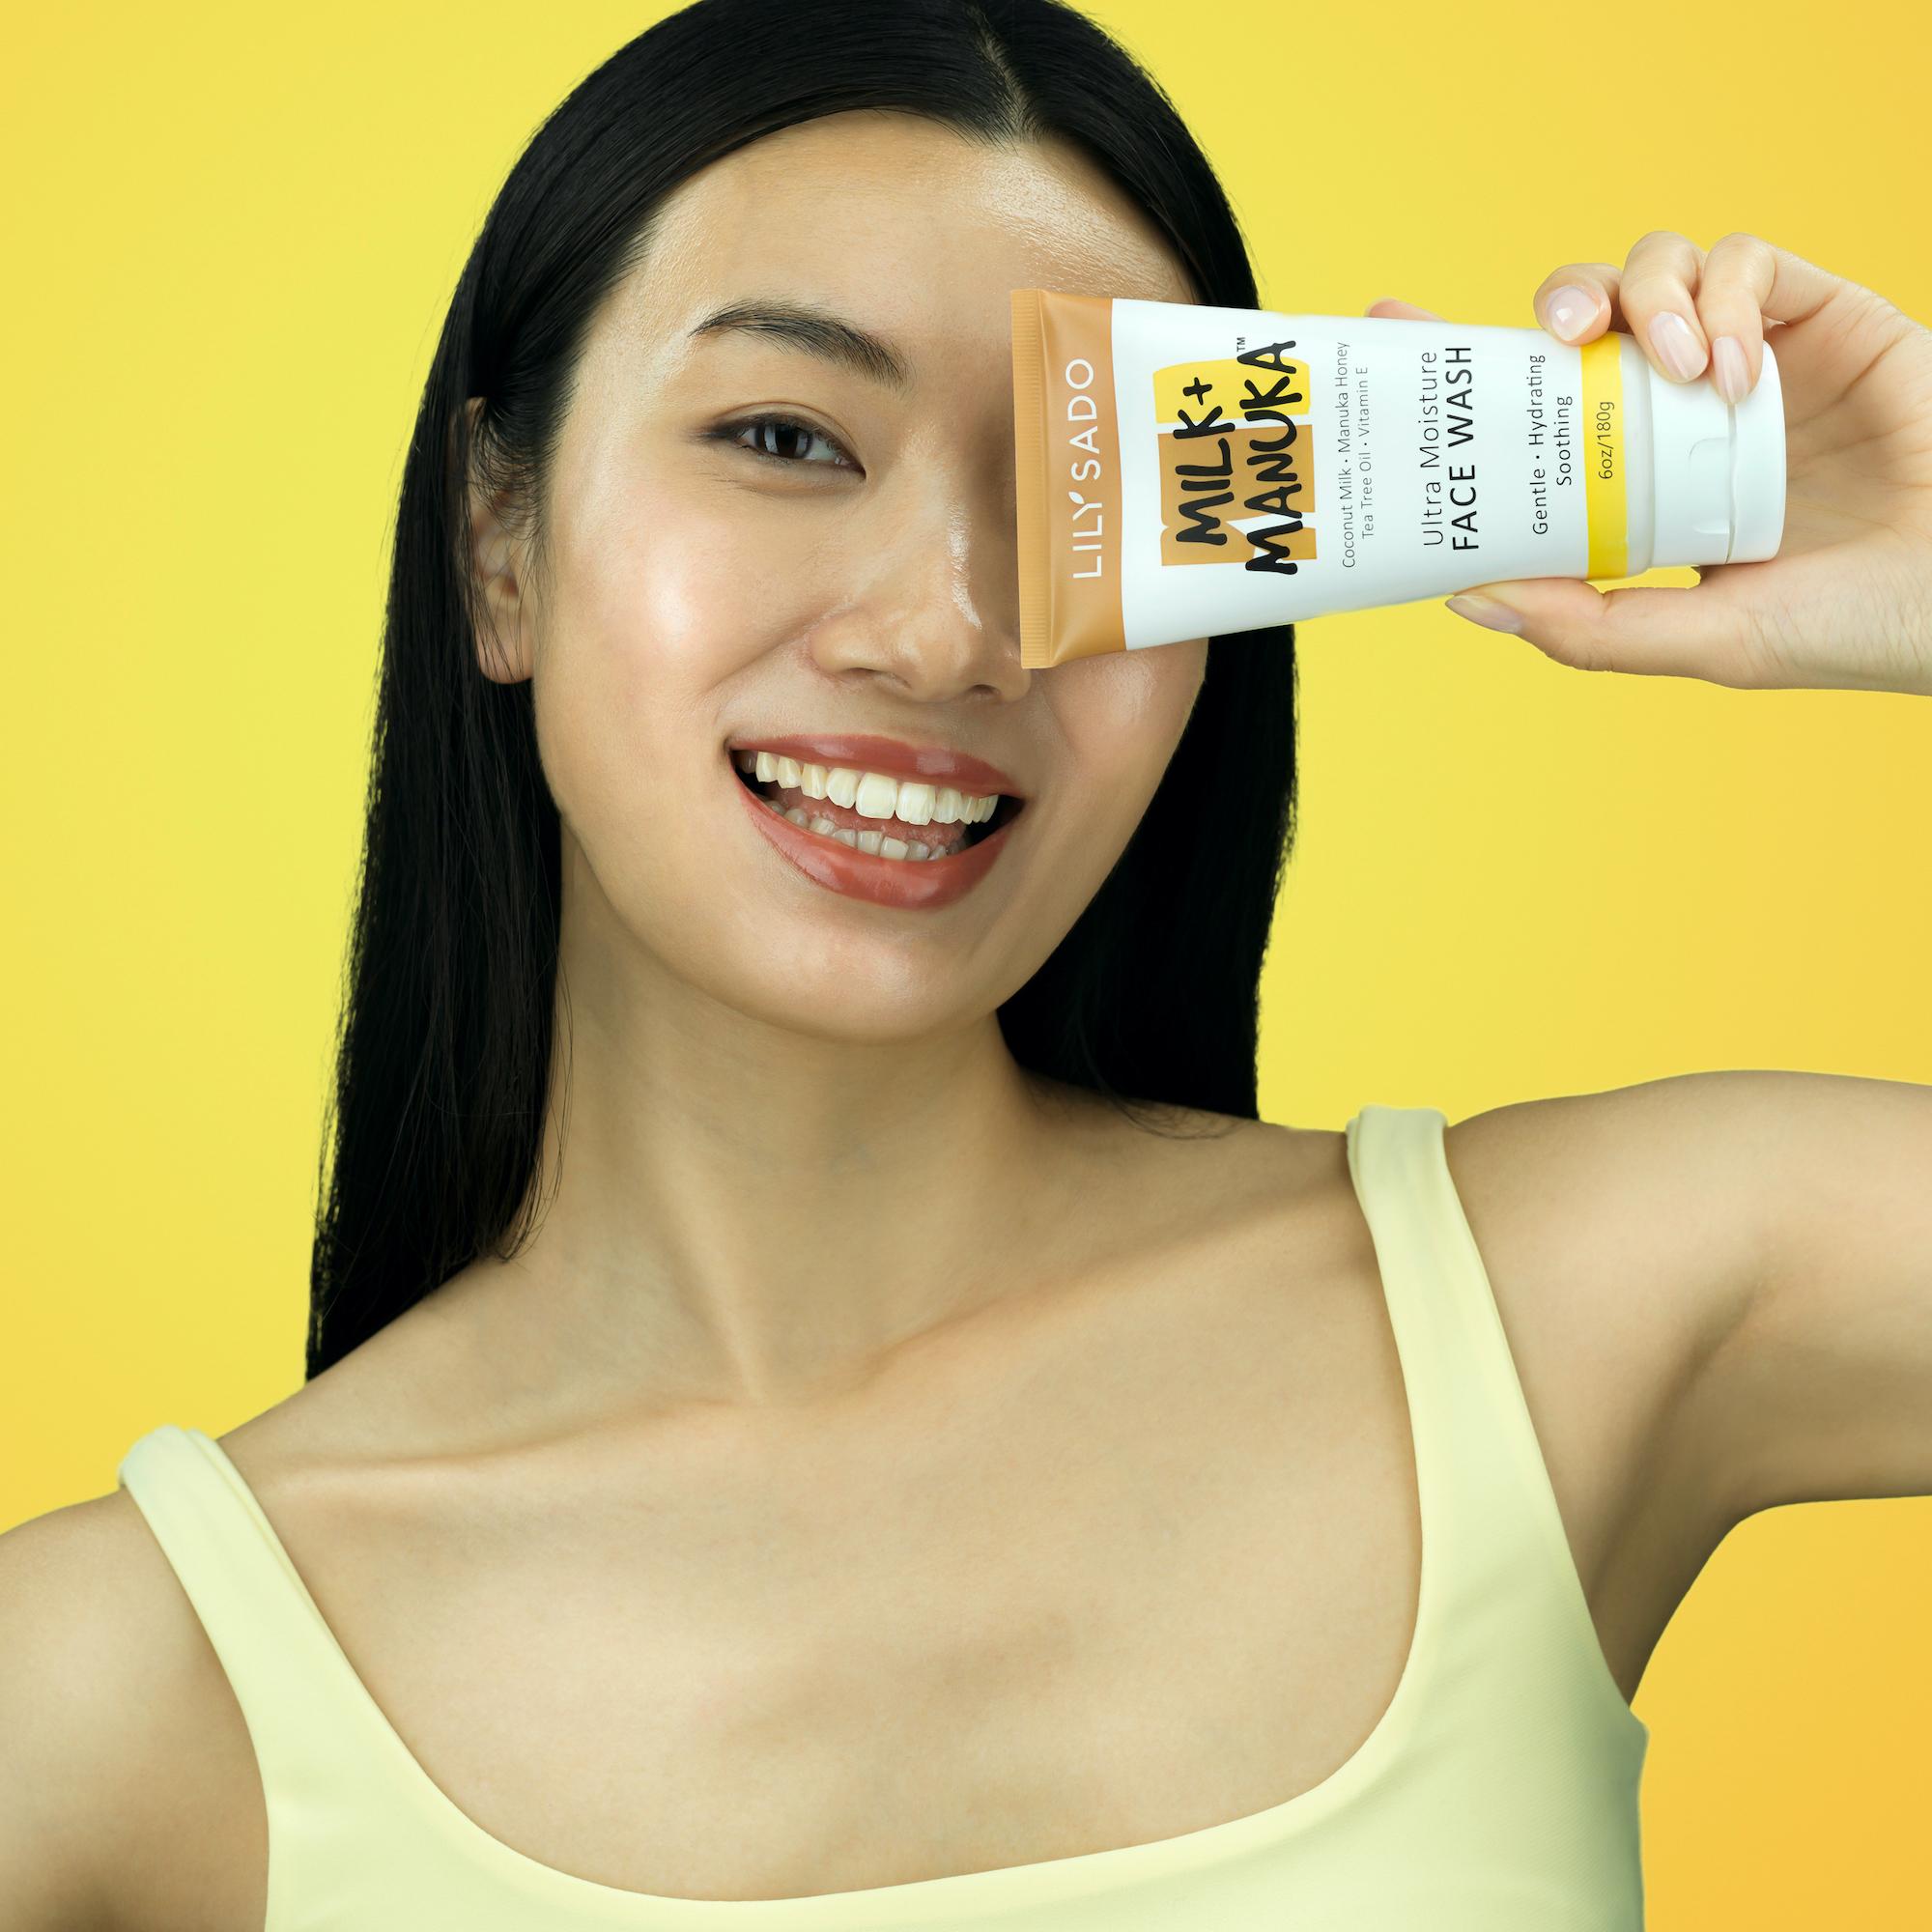 """Wabi-sabi"" and its influence on the award-winning skincare brand LILY SADO"